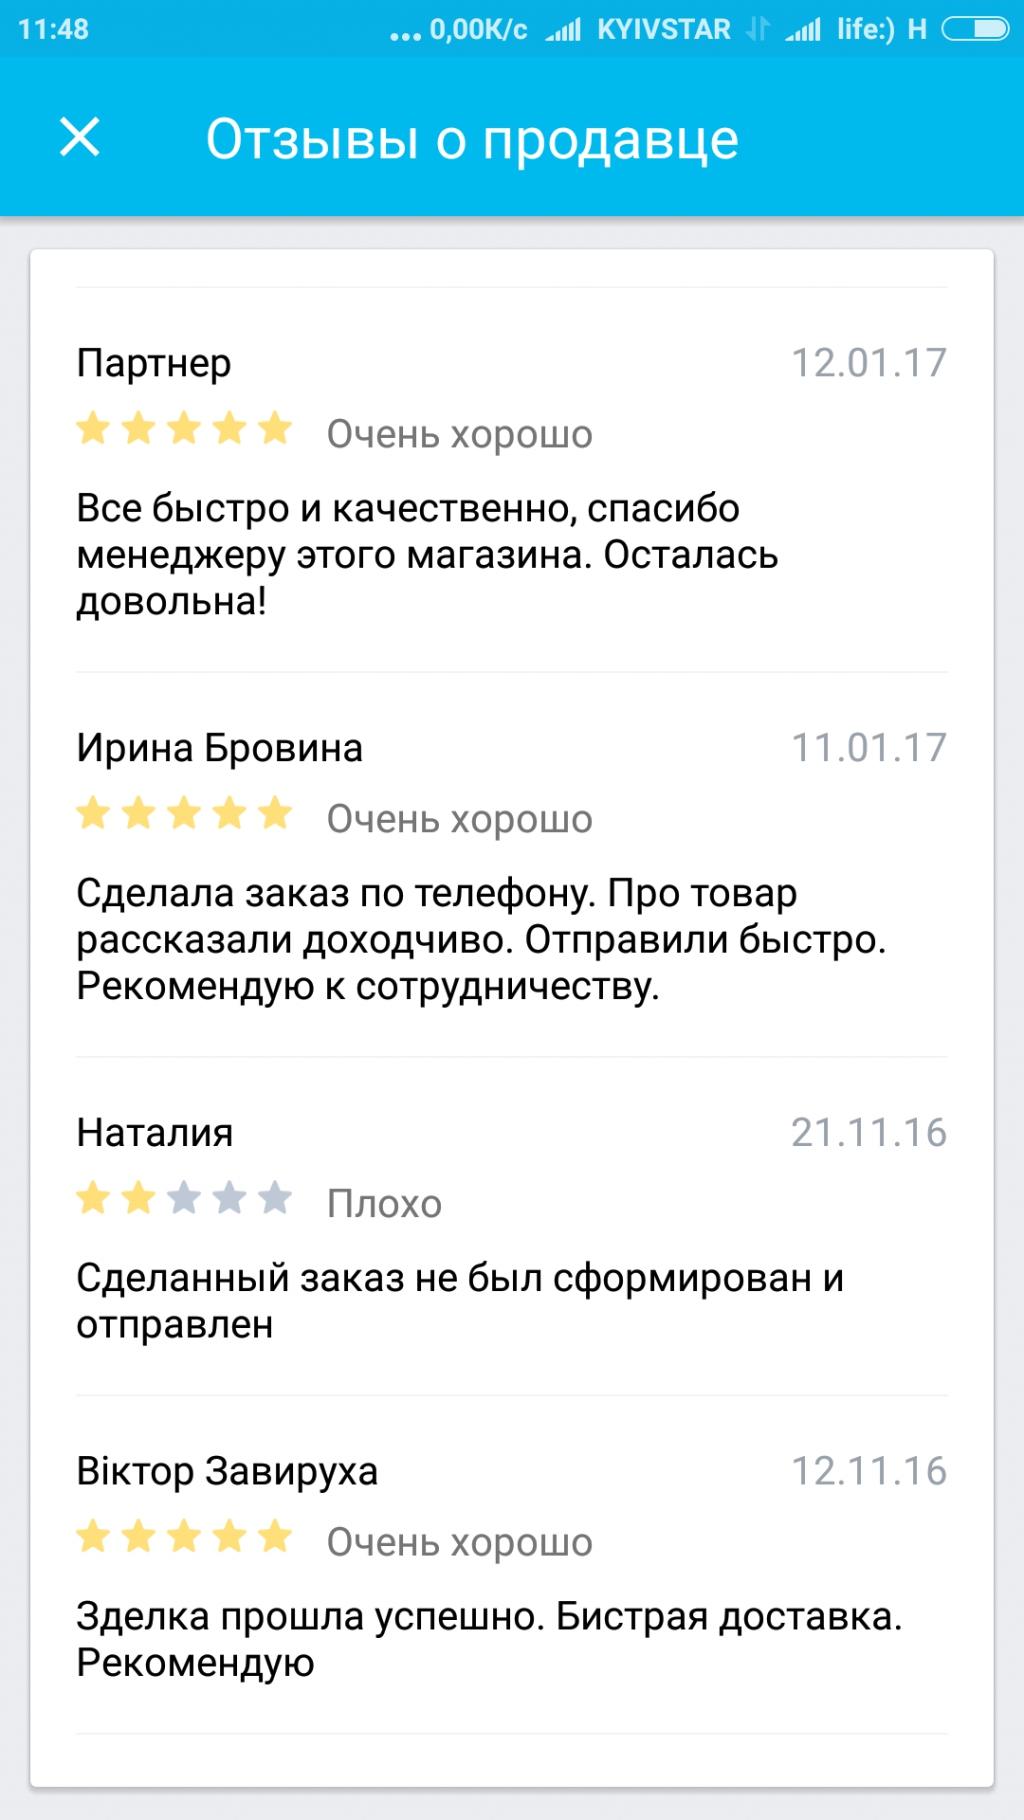 Prom.ua - Менеджеры Prom.ua нагло врут!!!